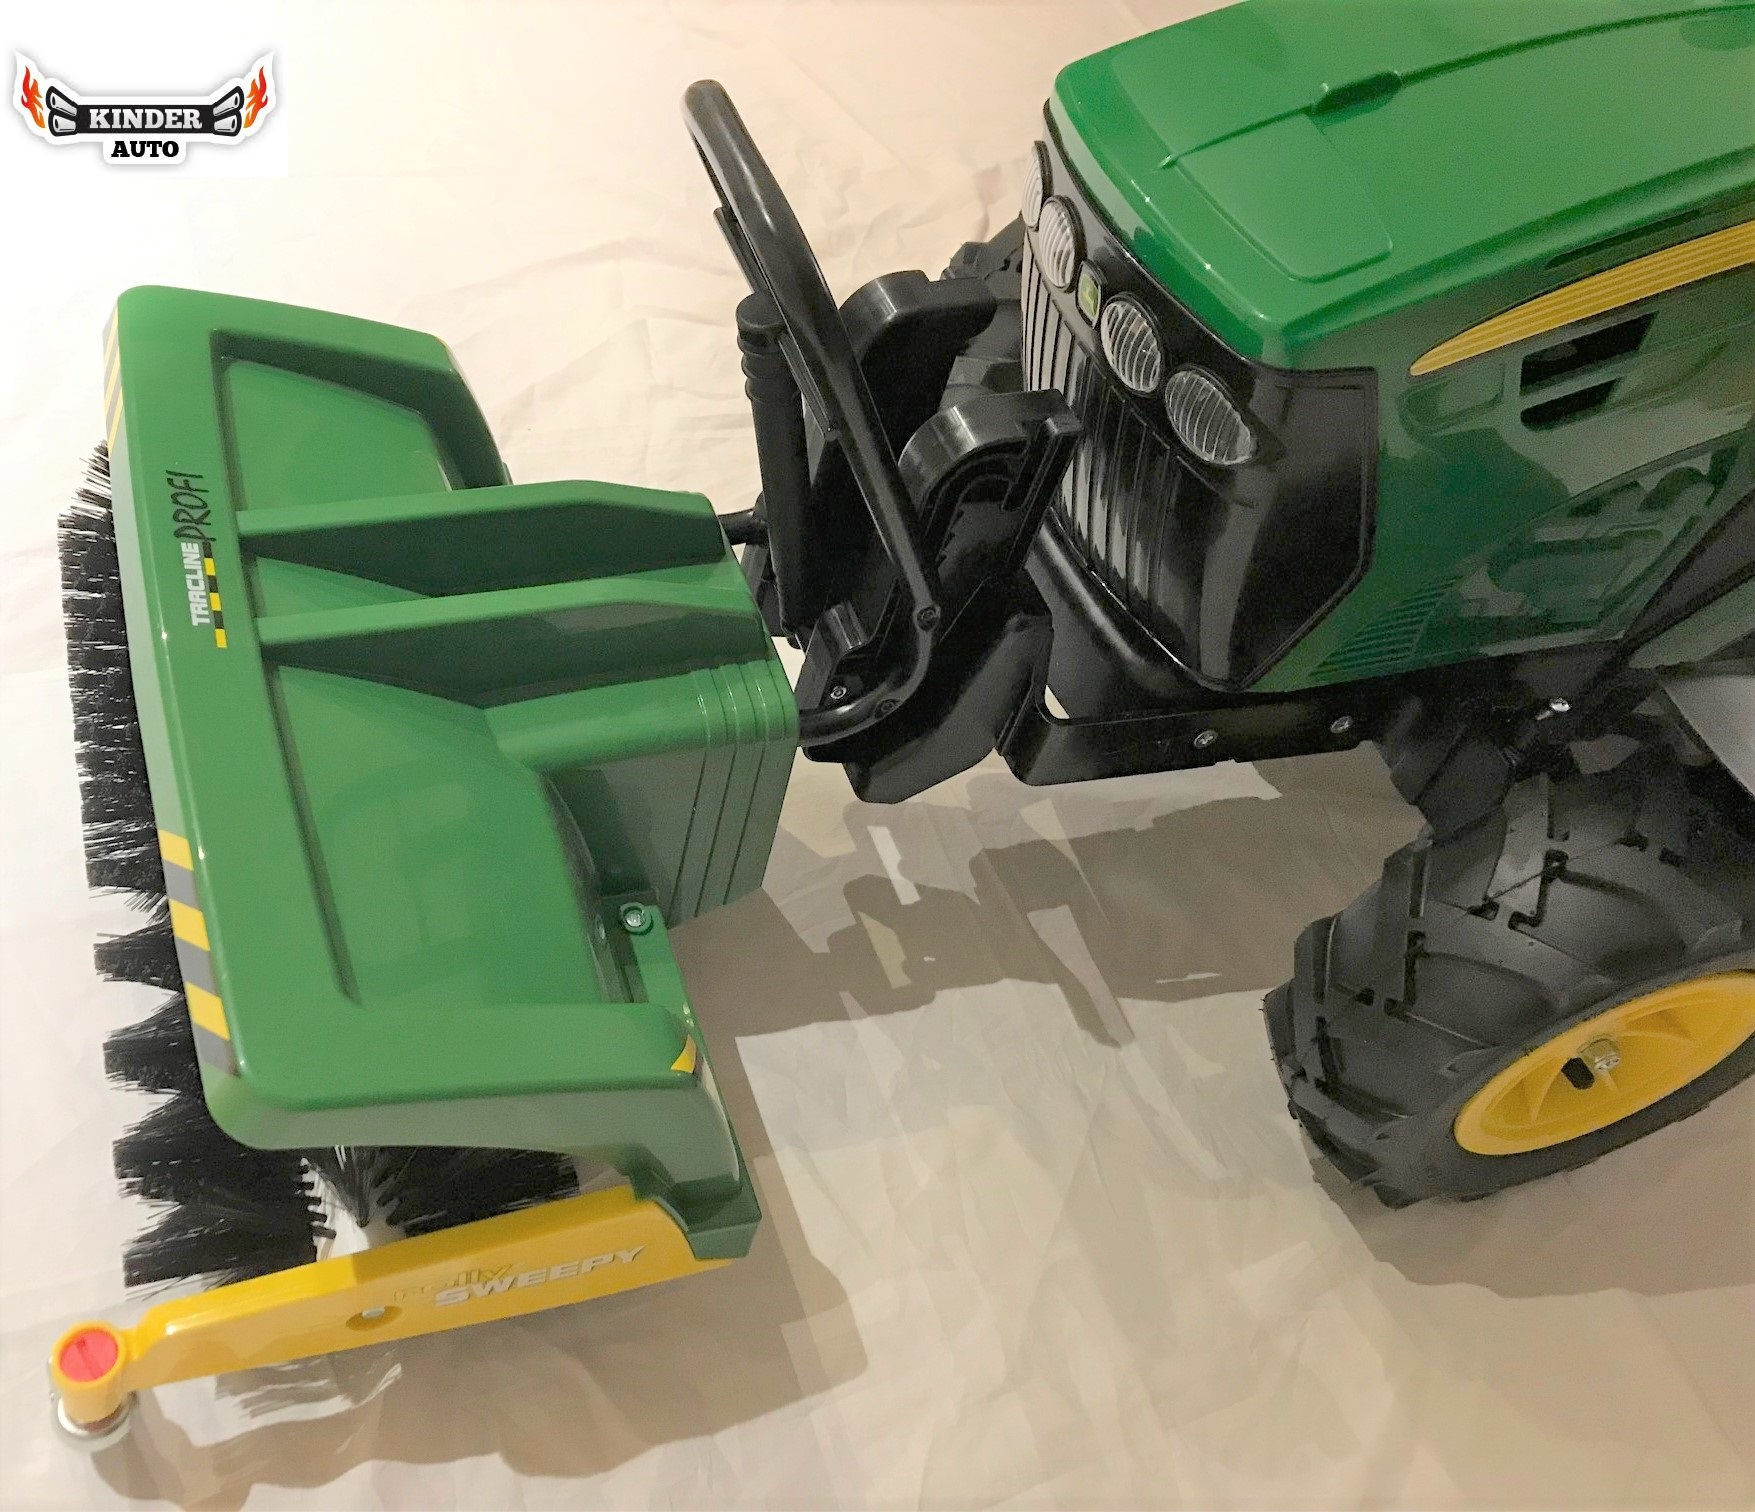 Rolly Toys Kehrmaschine Sweepy Fur Peg Perego Traktoren Kinderauto Online Shop